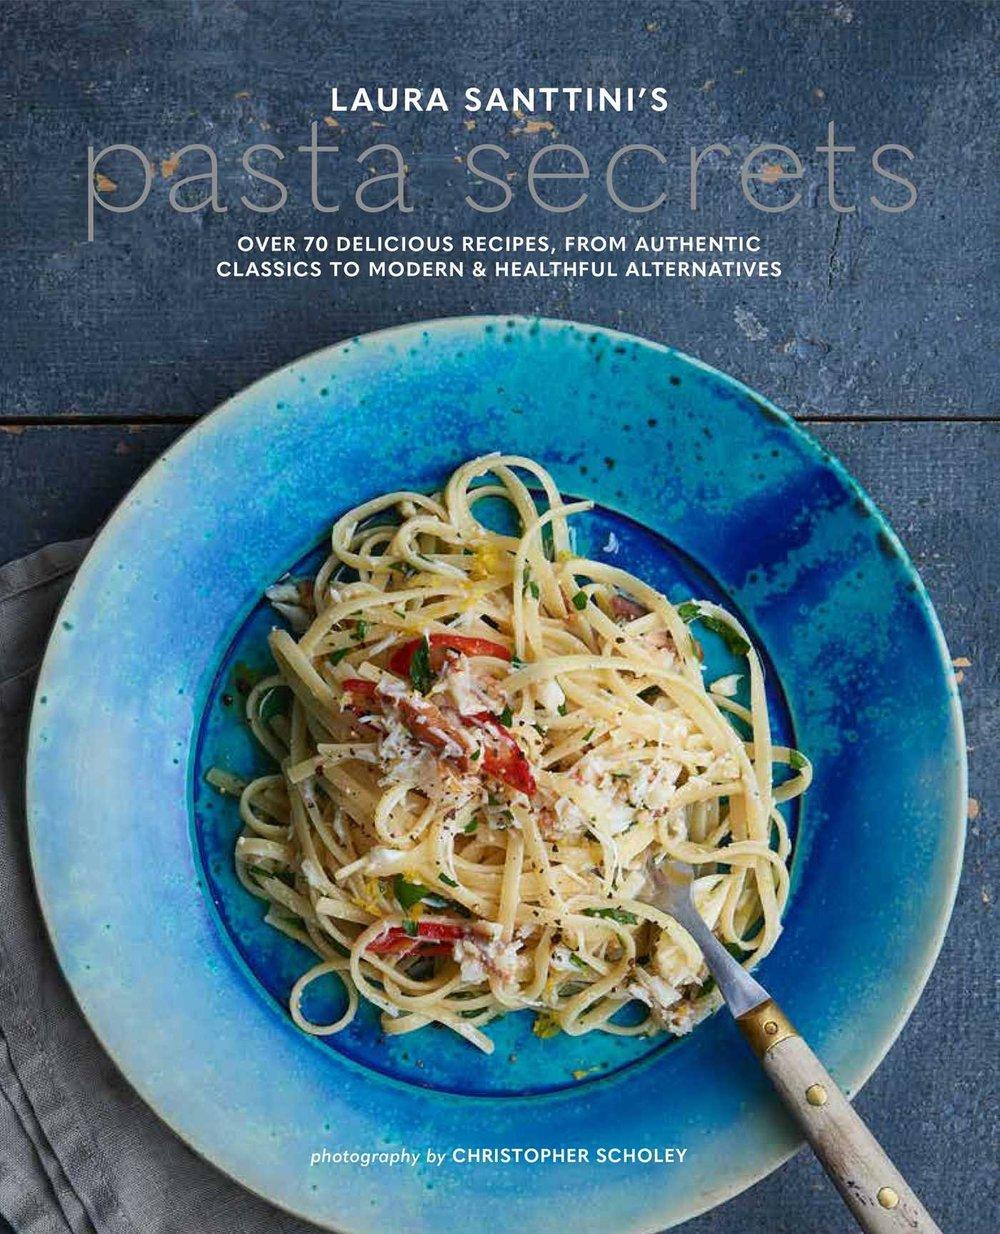 Laura-Santtini-Pasta-Secrets-01.jpg